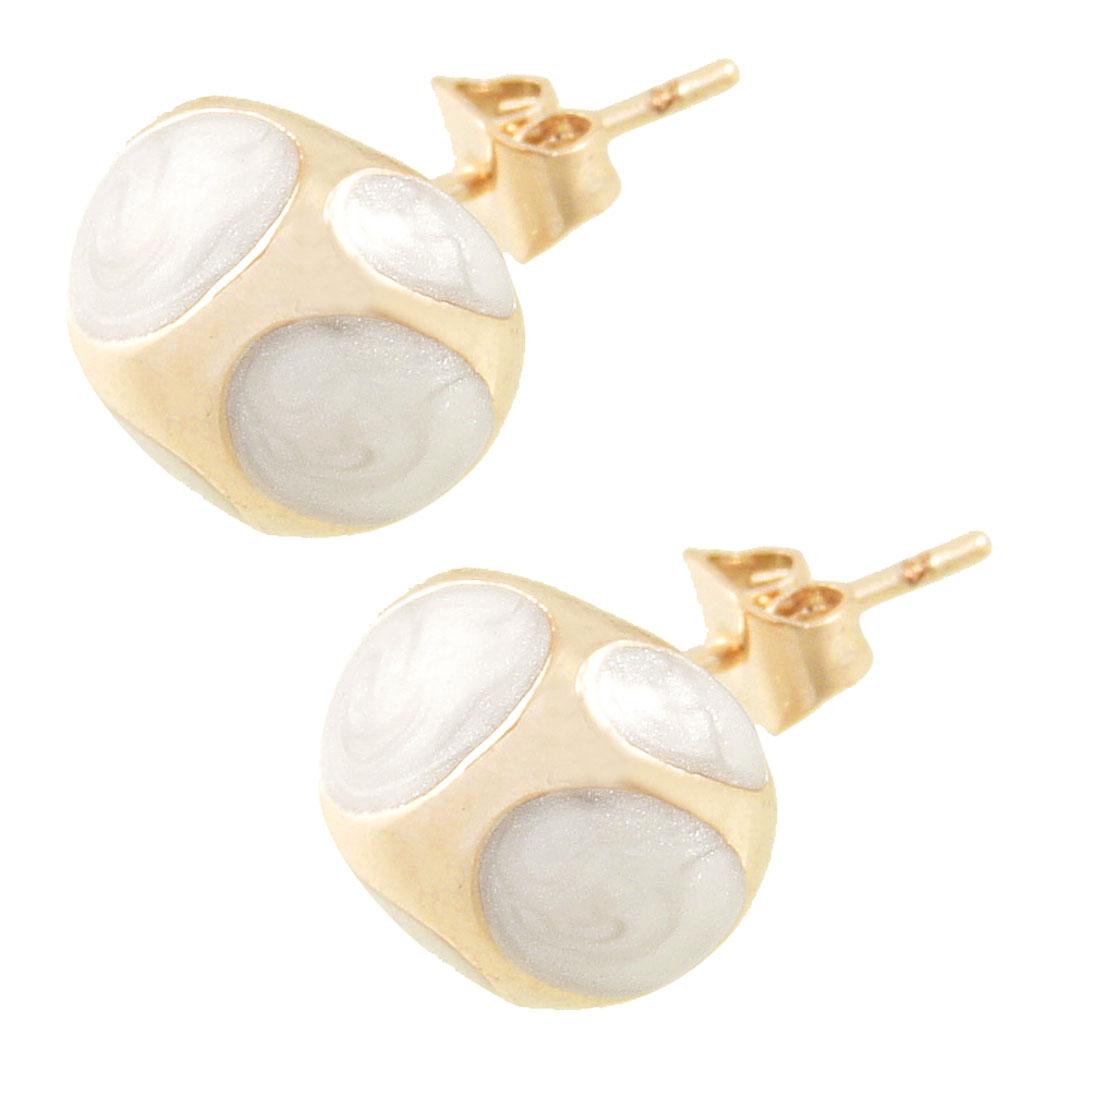 2 Pcs Gold Tone White Plastic Metal Enamel Oval Ear Stud Earrings Gift